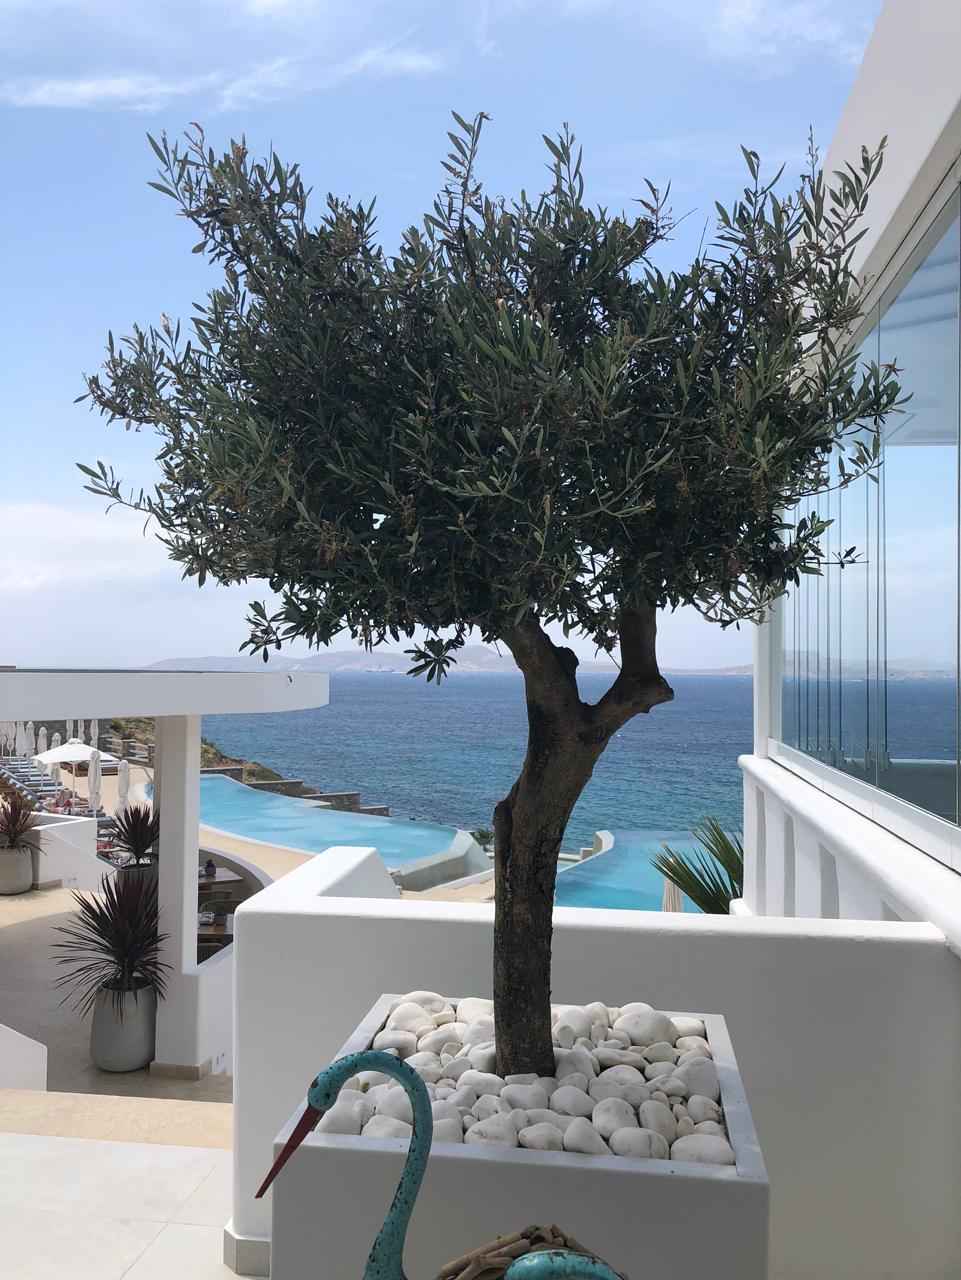 Anax Hotel Mykonos